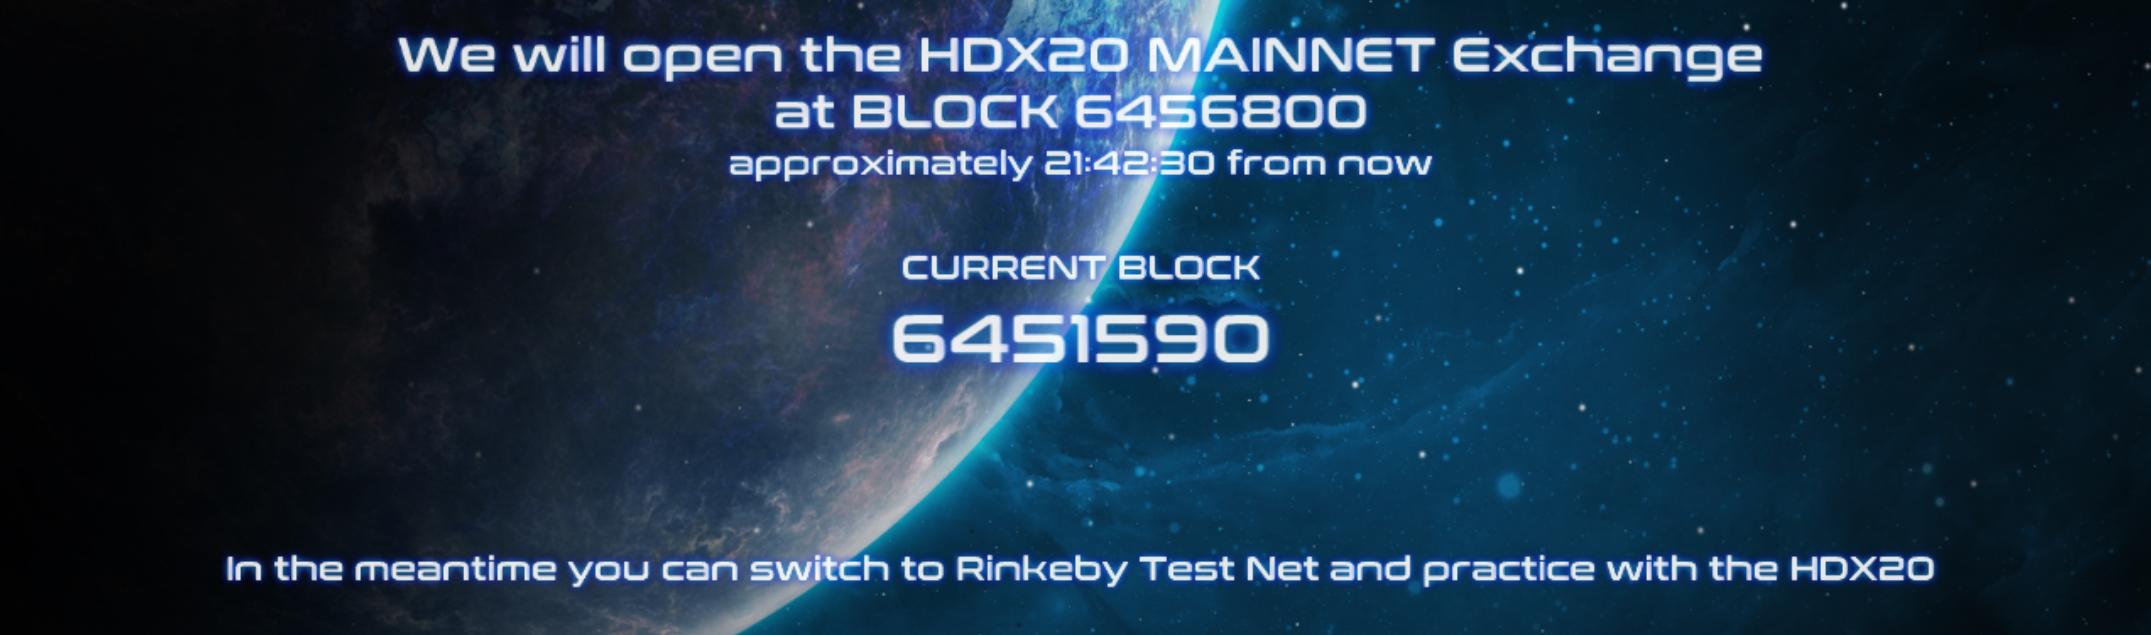 HDX20 Opening at block 6456800